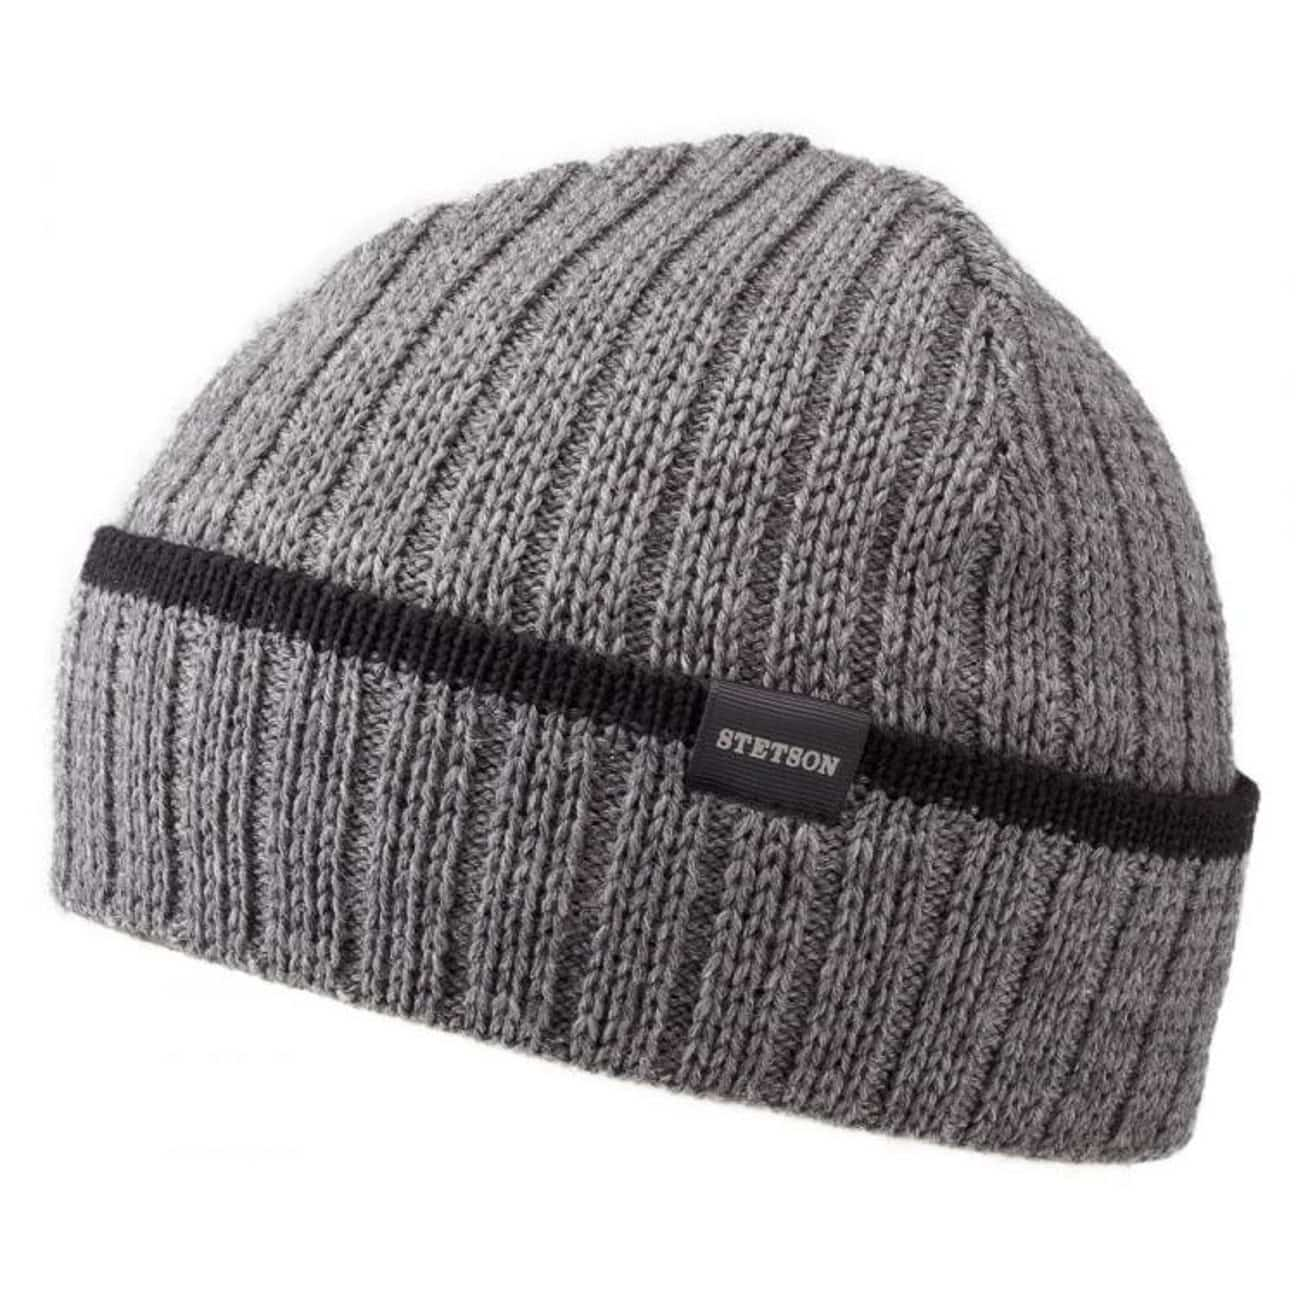 ... Seminole Merino Wool Hat by Stetson - grey 1 ... cf831f34a048